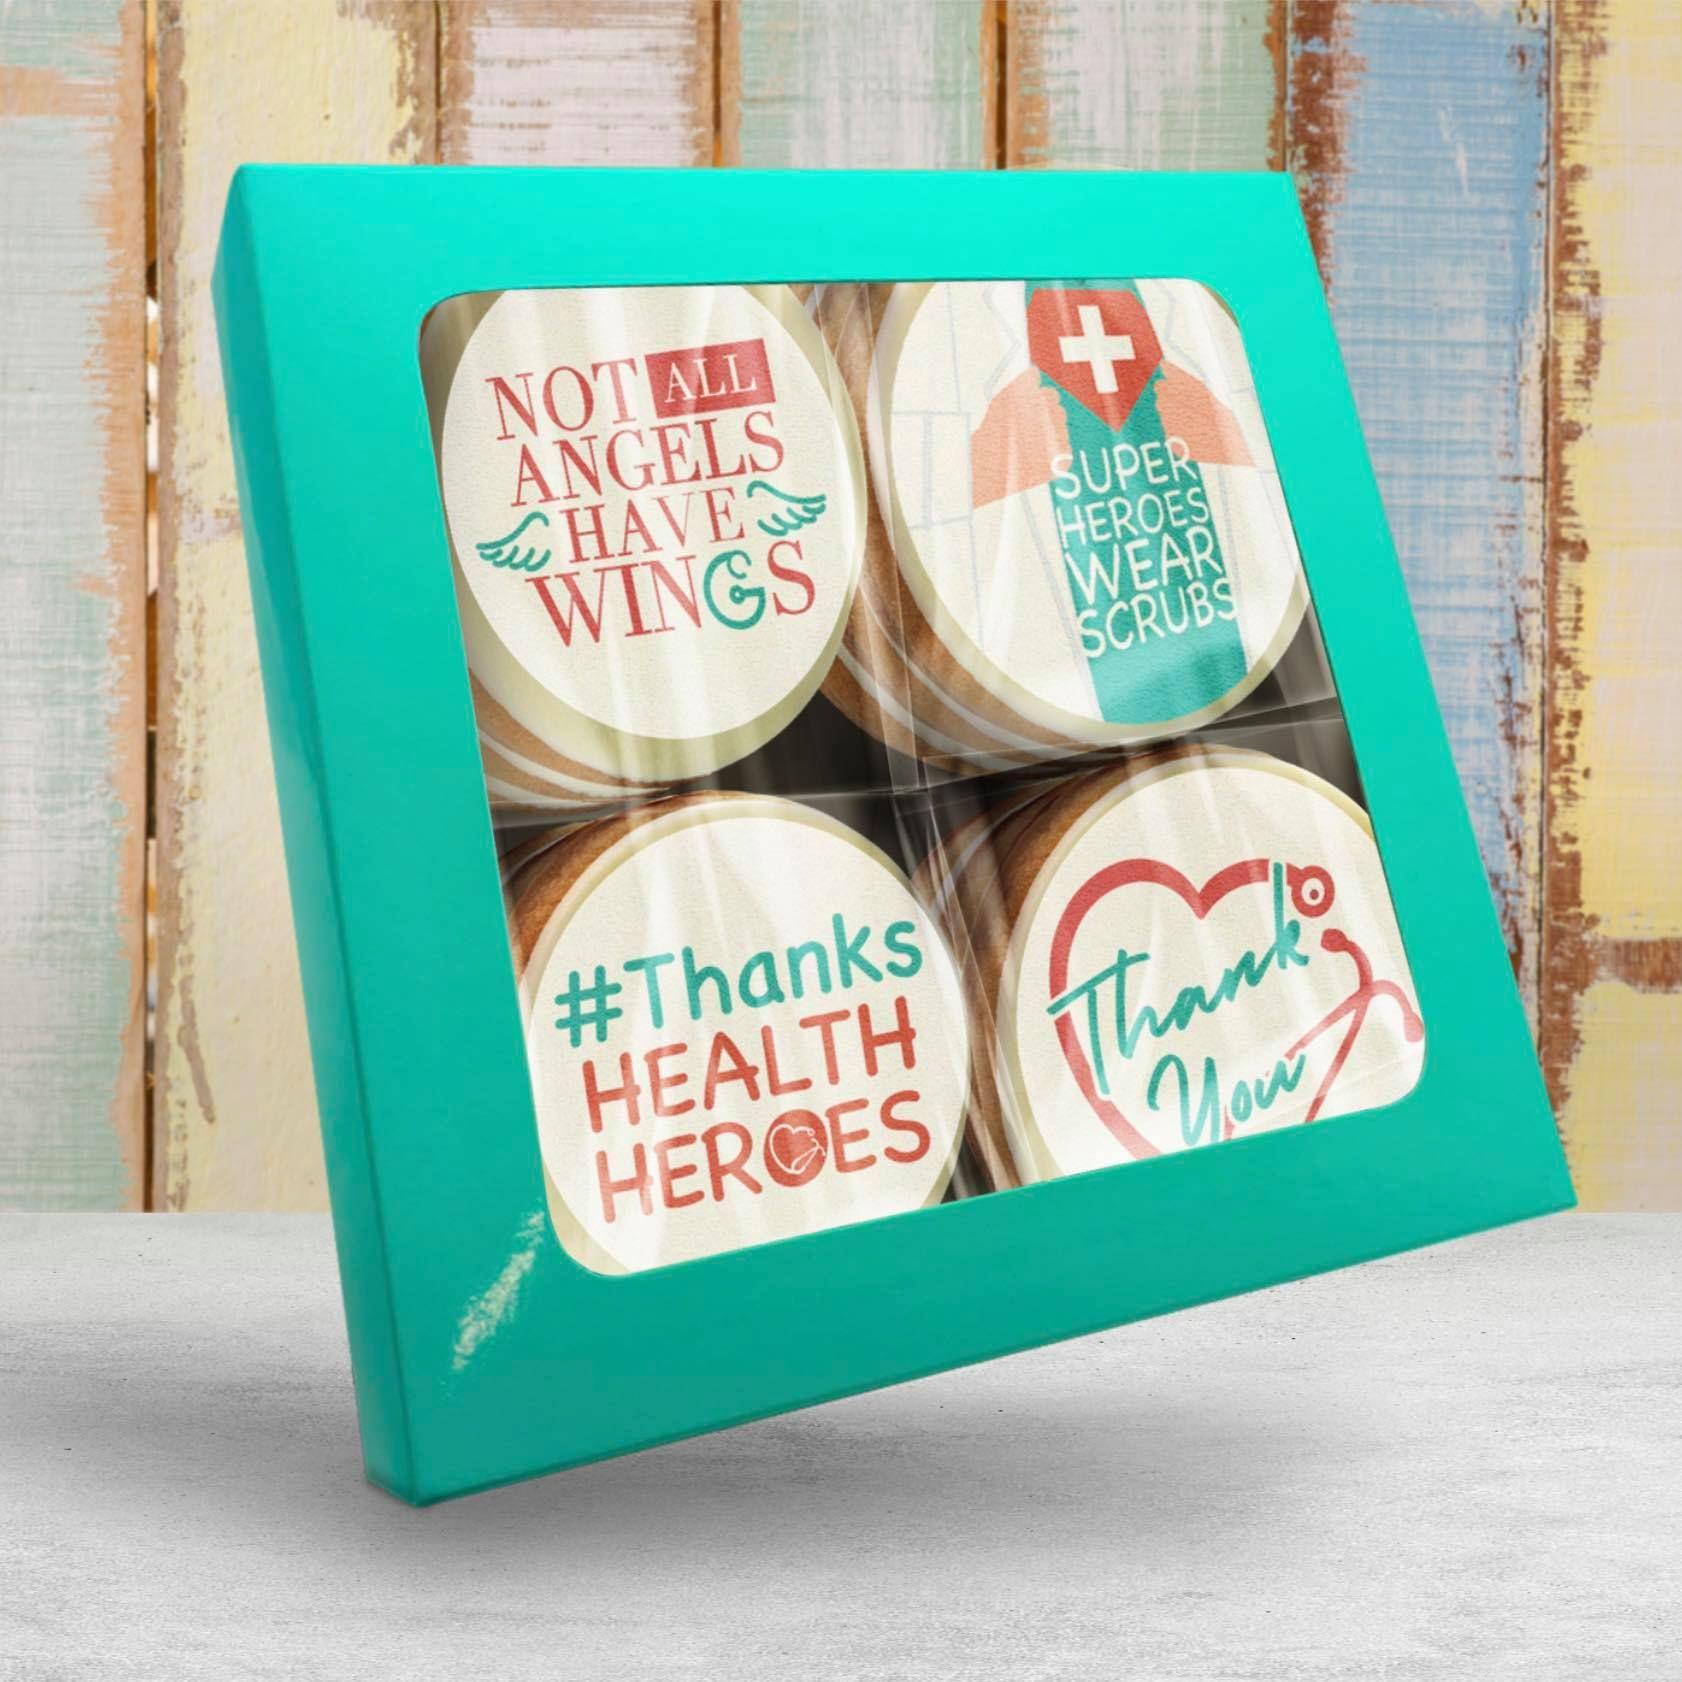 Health care hero cookies